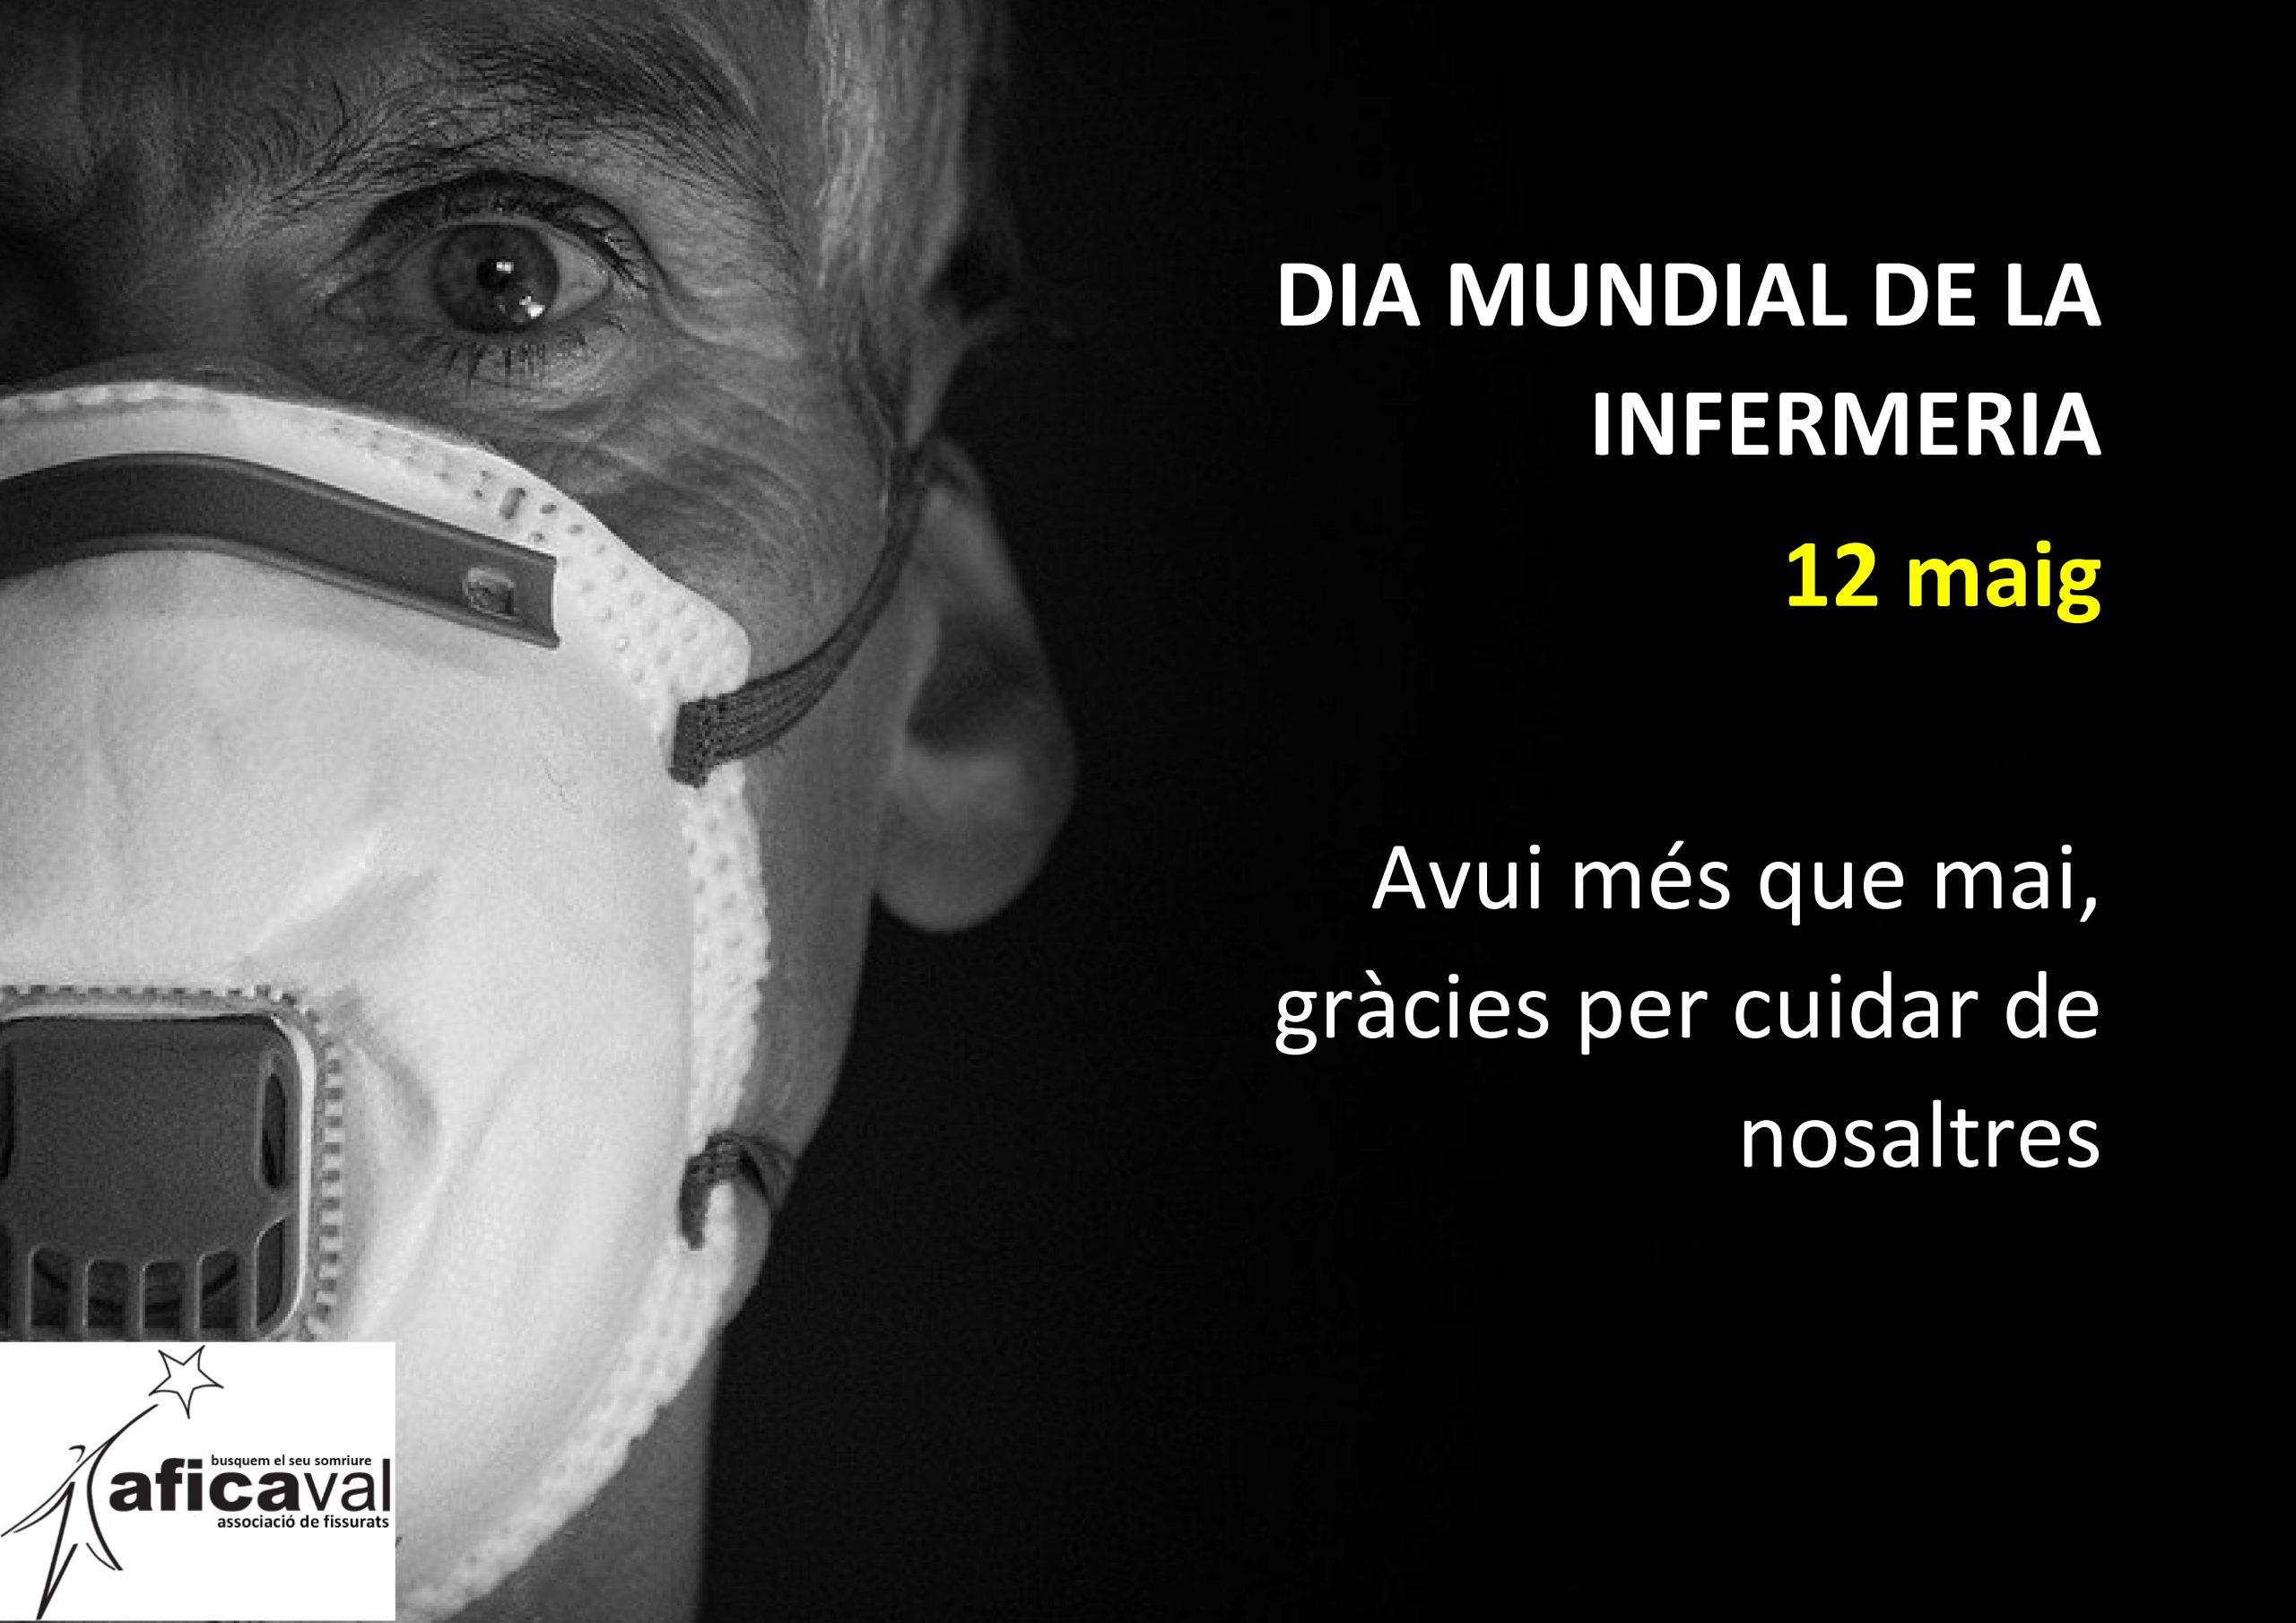 Dia Mundial de la Infermeria